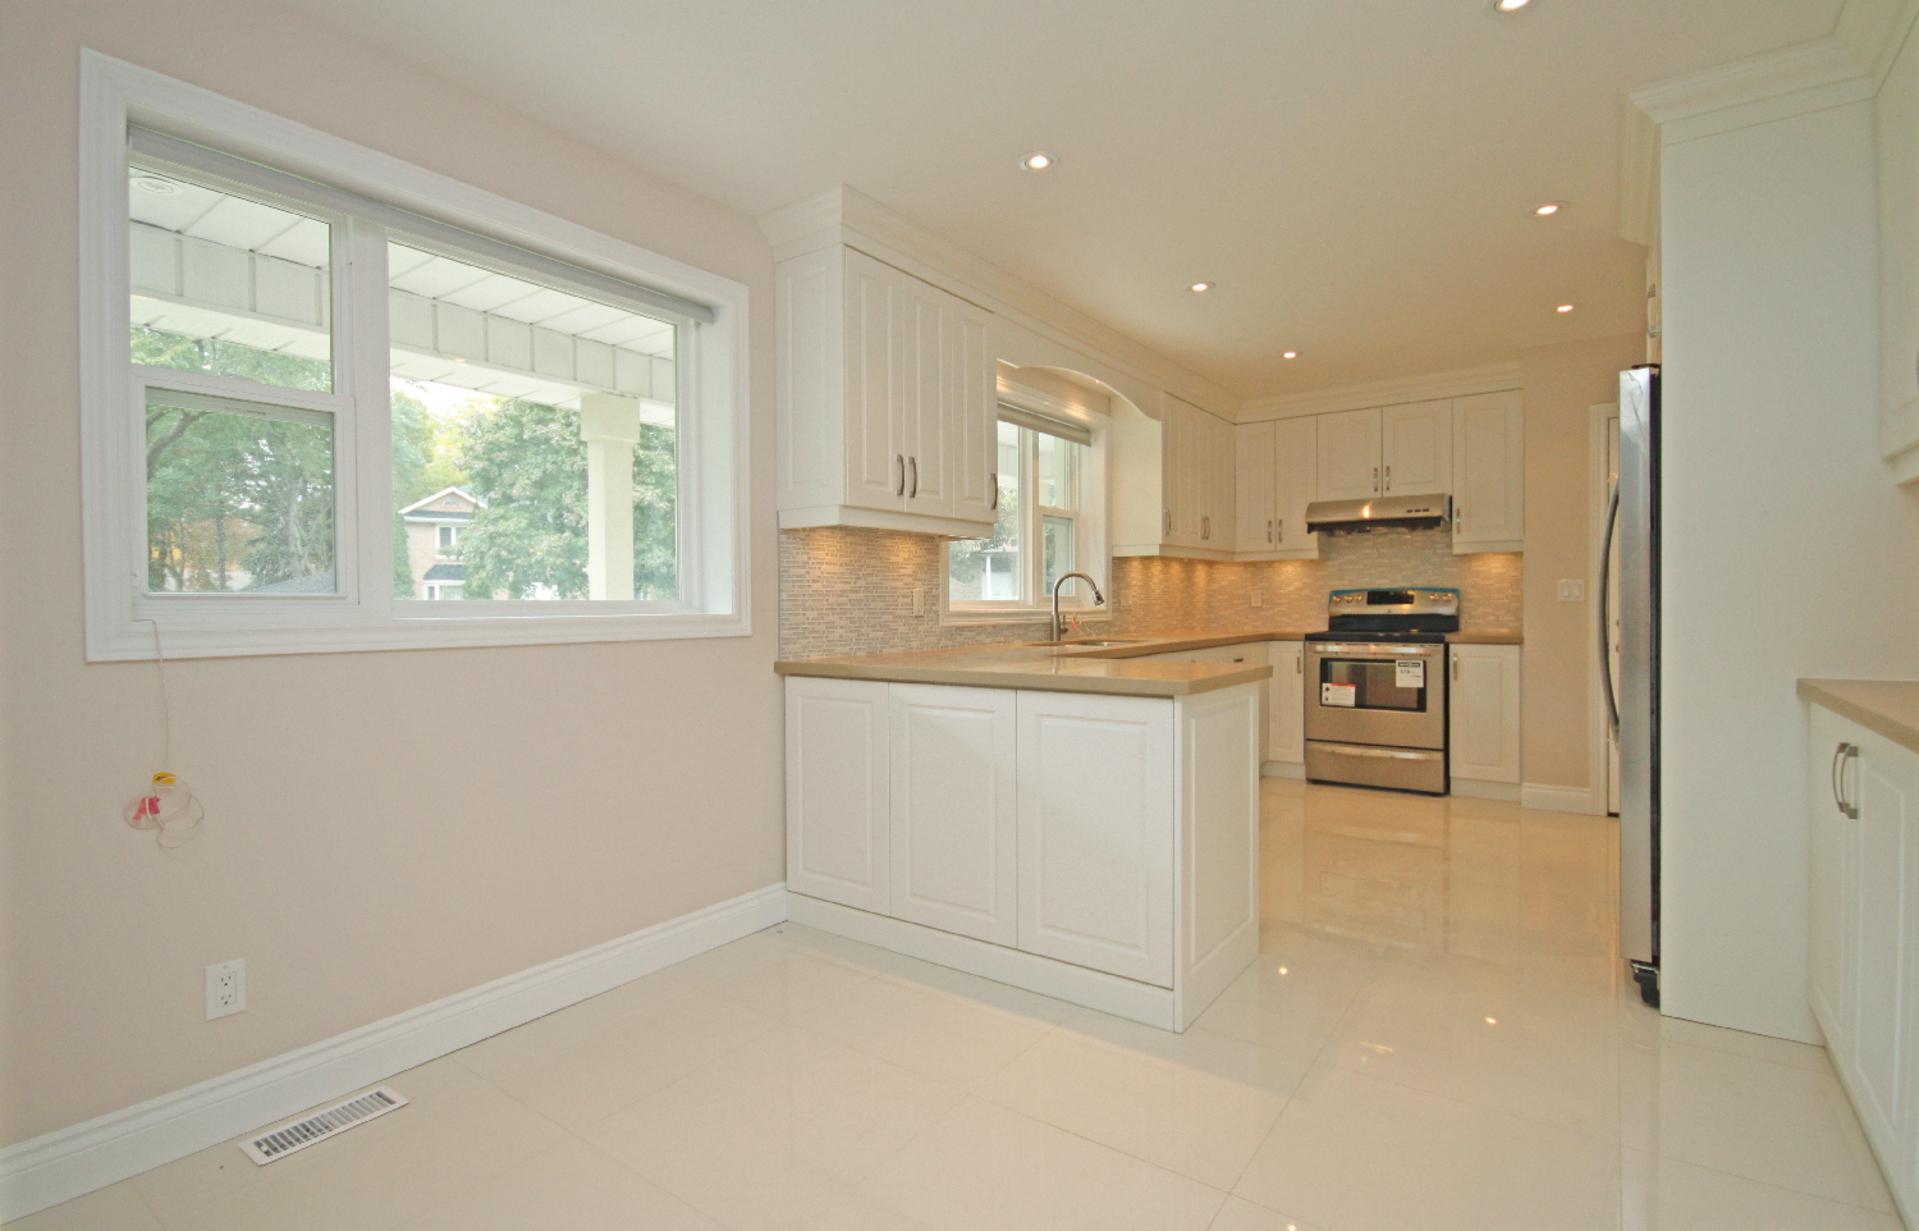 Kitchen at 11 Tetbury Crescent, Parkwoods-Donalda, Toronto